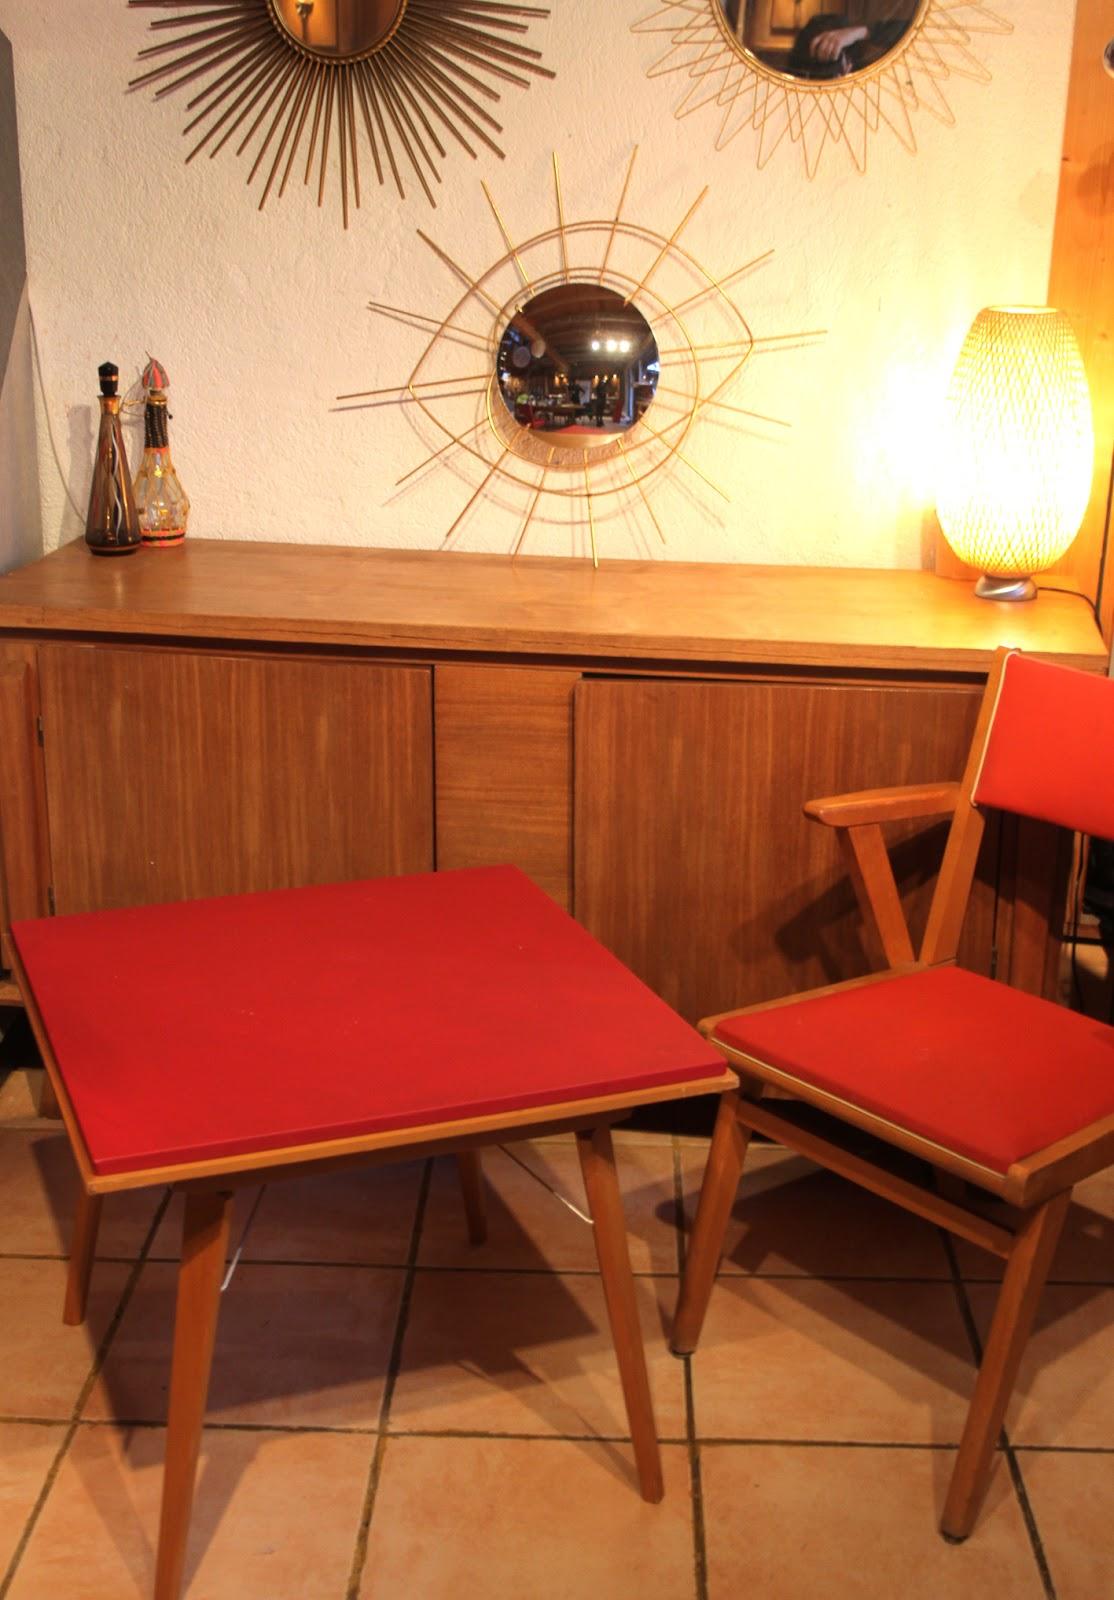 chicbaazar objets vintage 50 60 70 table bridge scandinave annee 50